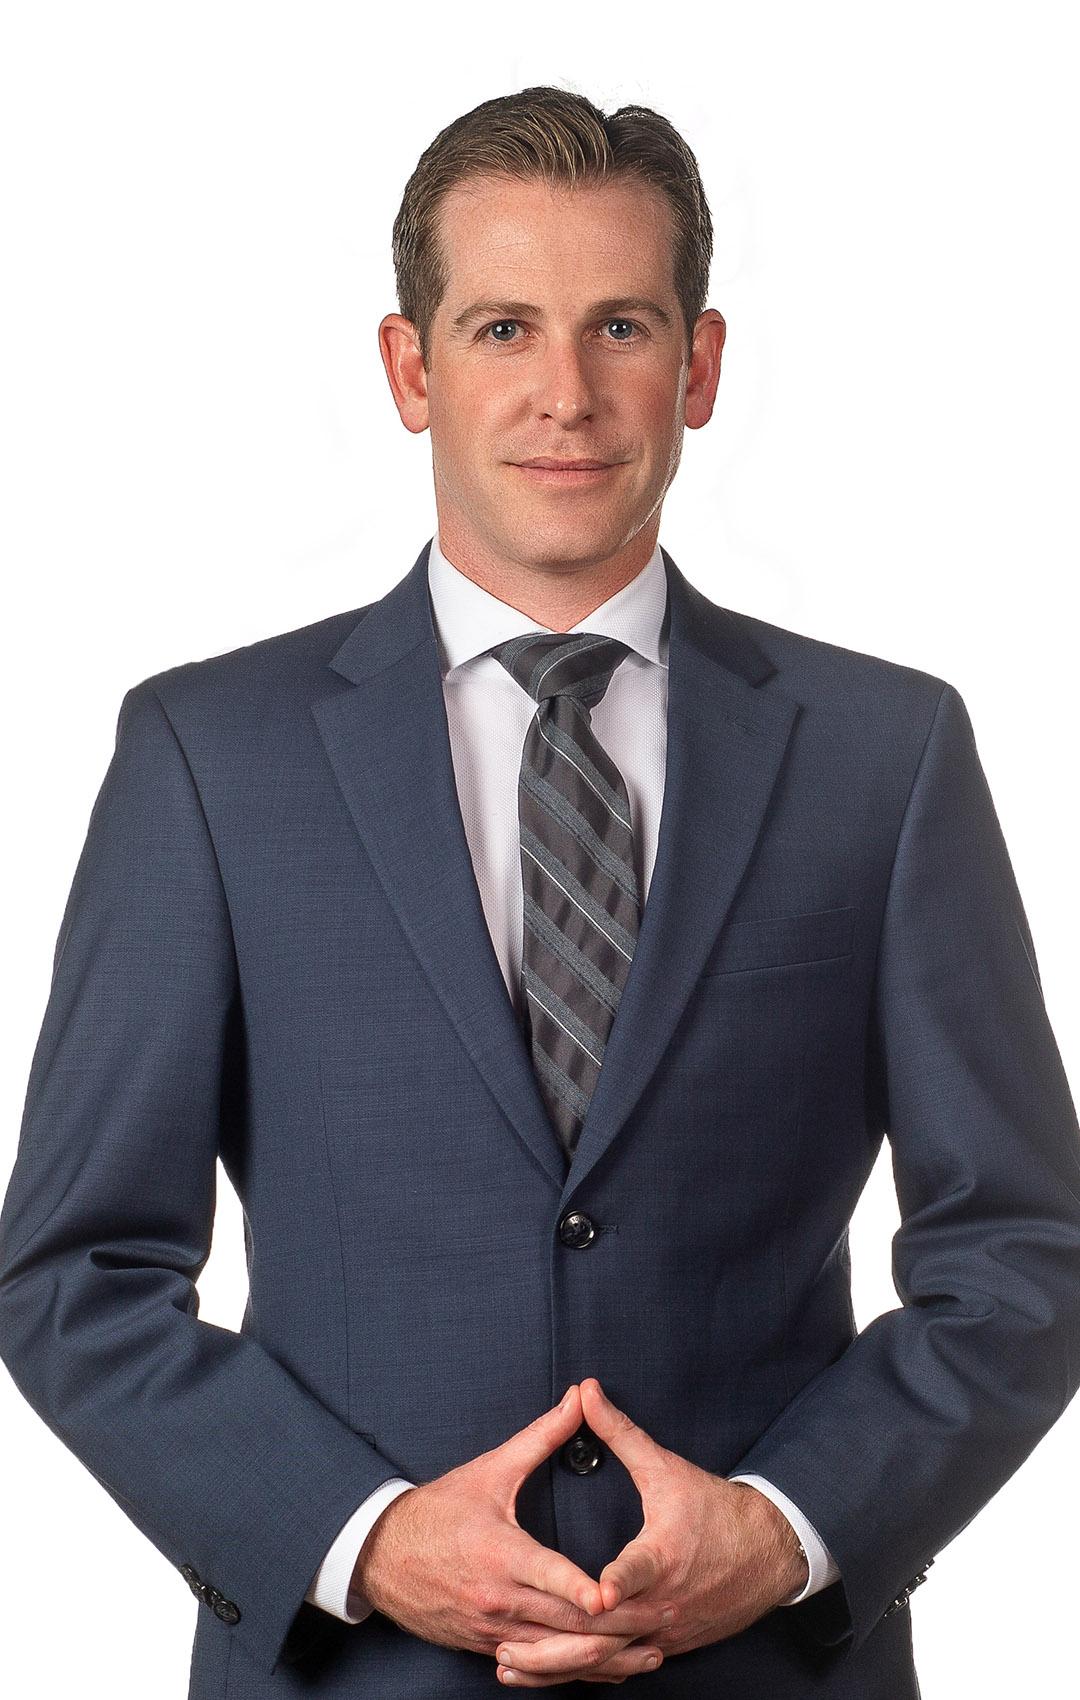 Sean C. Langton